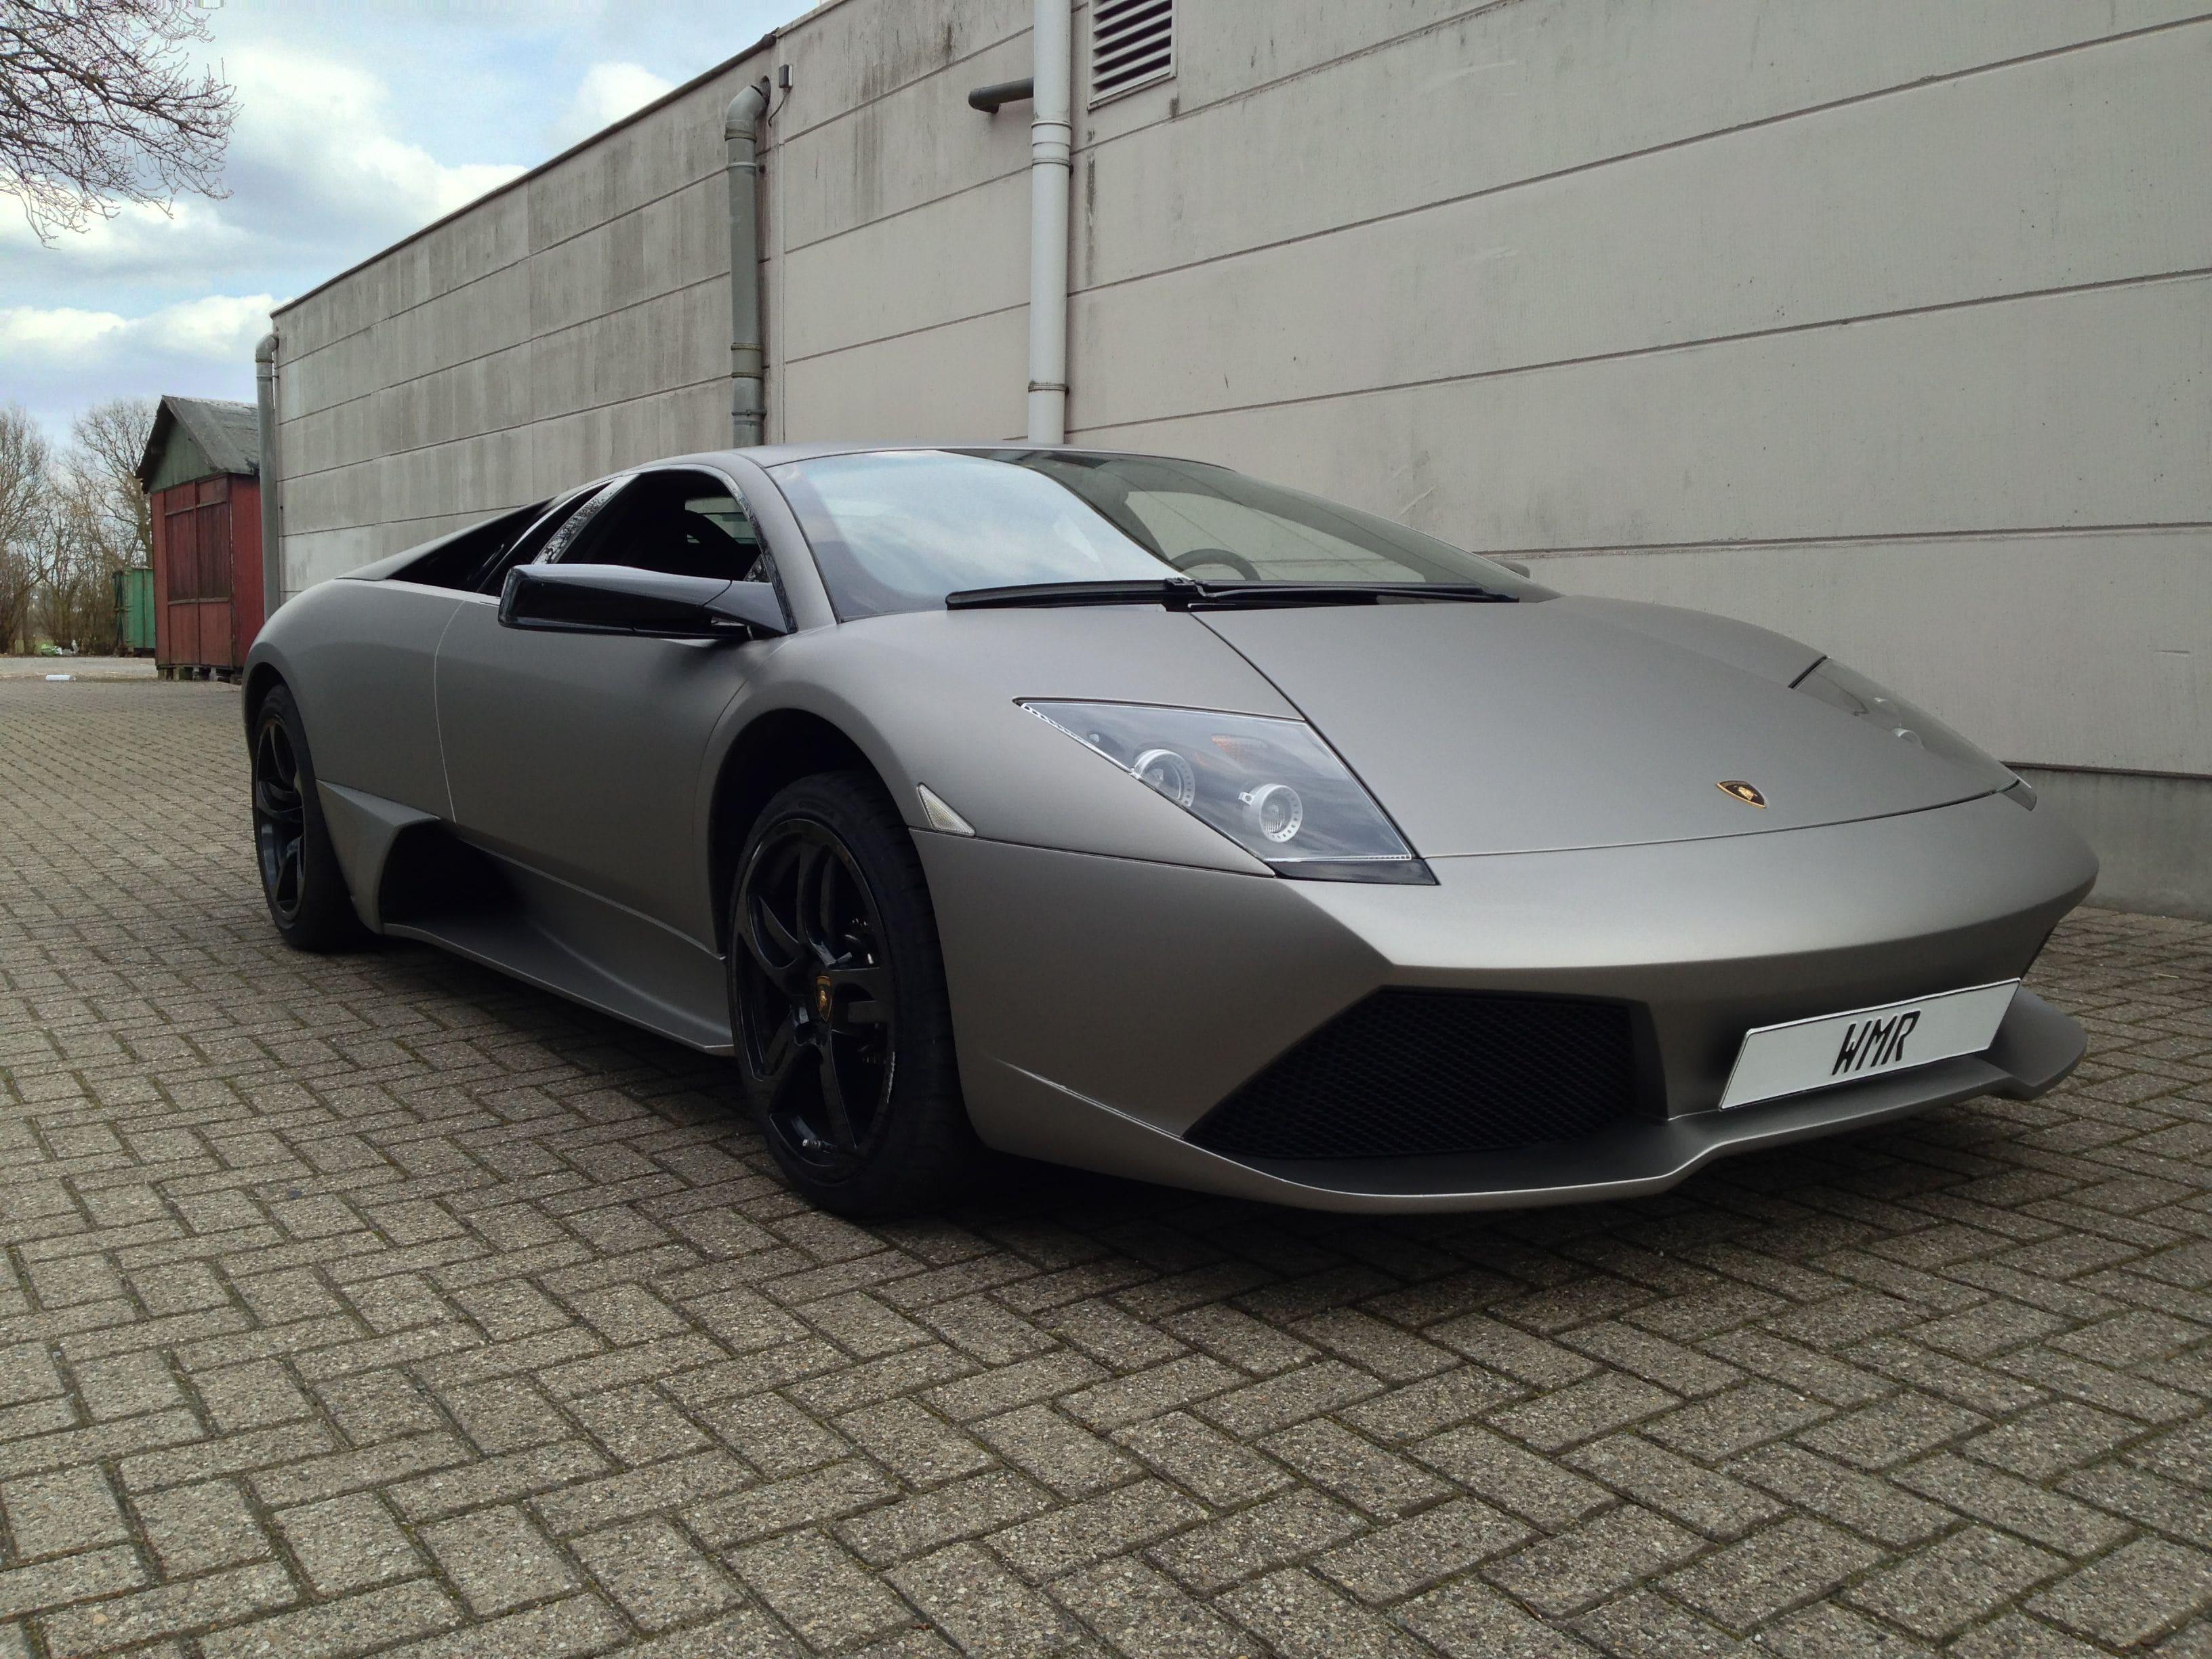 Lamborghini Murcialago LP670 met Gunpowder Wrap, Carwrapping door Wrapmyride.nu Foto-nr:5973, ©2021